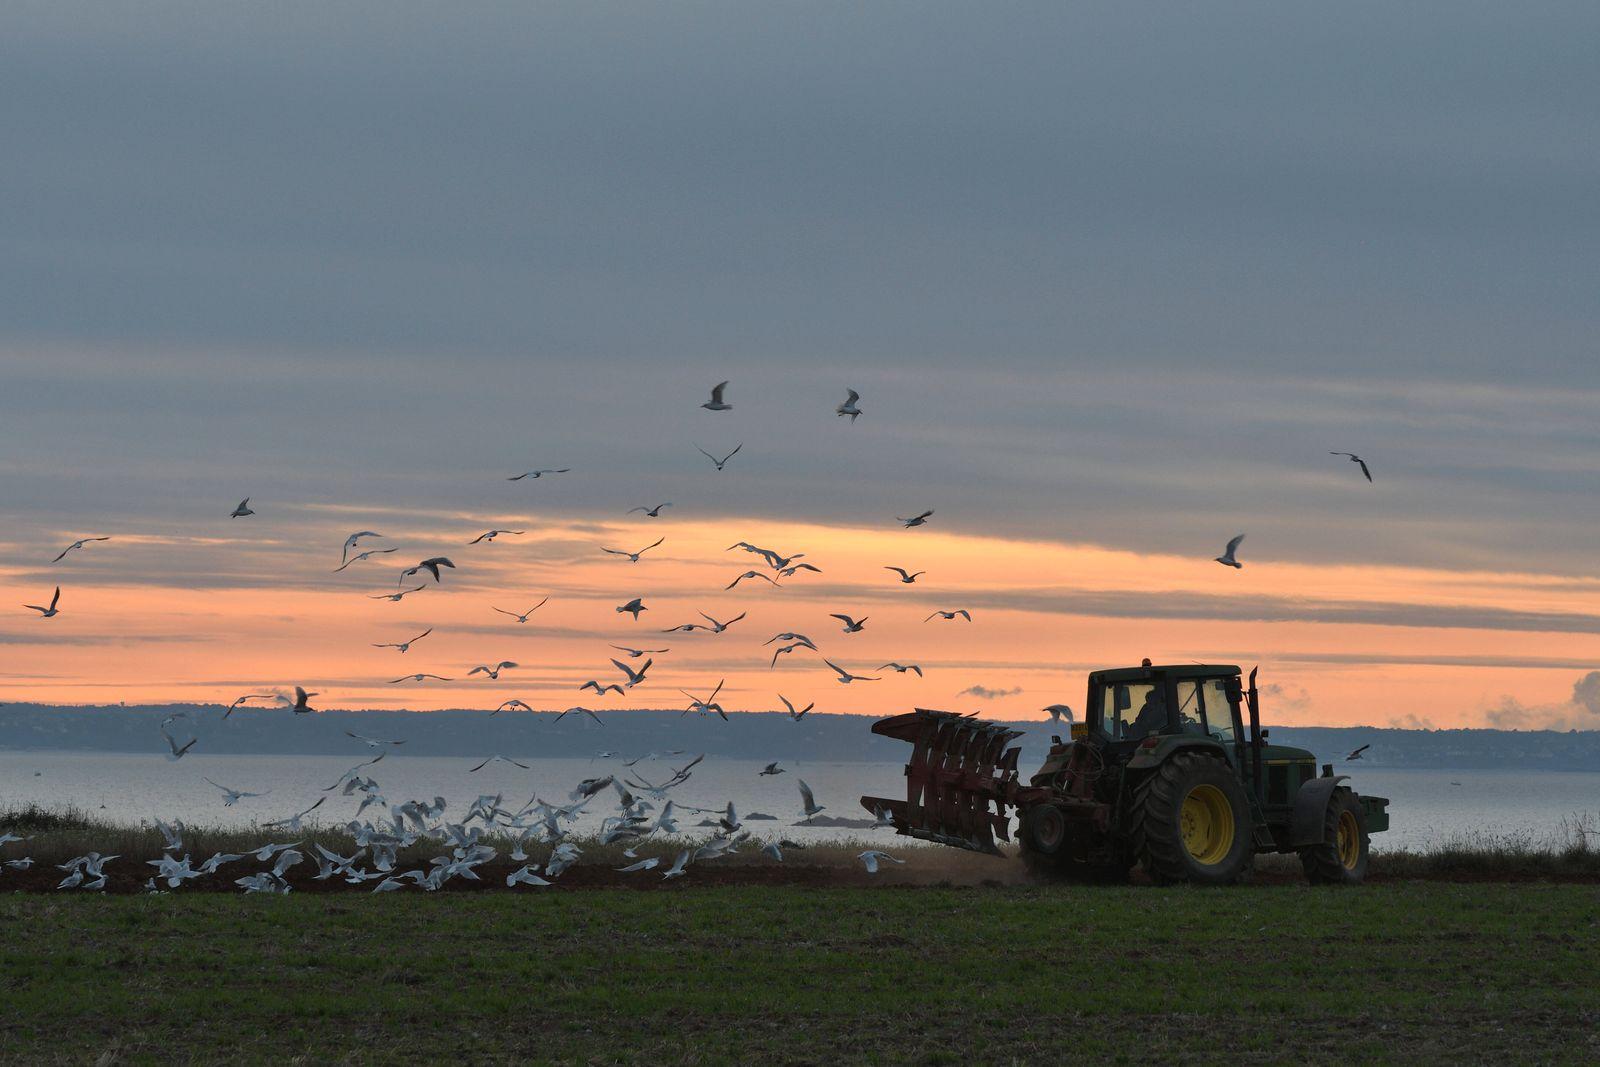 Landwirt pfluegt ein Feld im Abendrot, Frankreich, Bretagne, Côtes-d Armor, Erquy farmer plowing a field in red evening